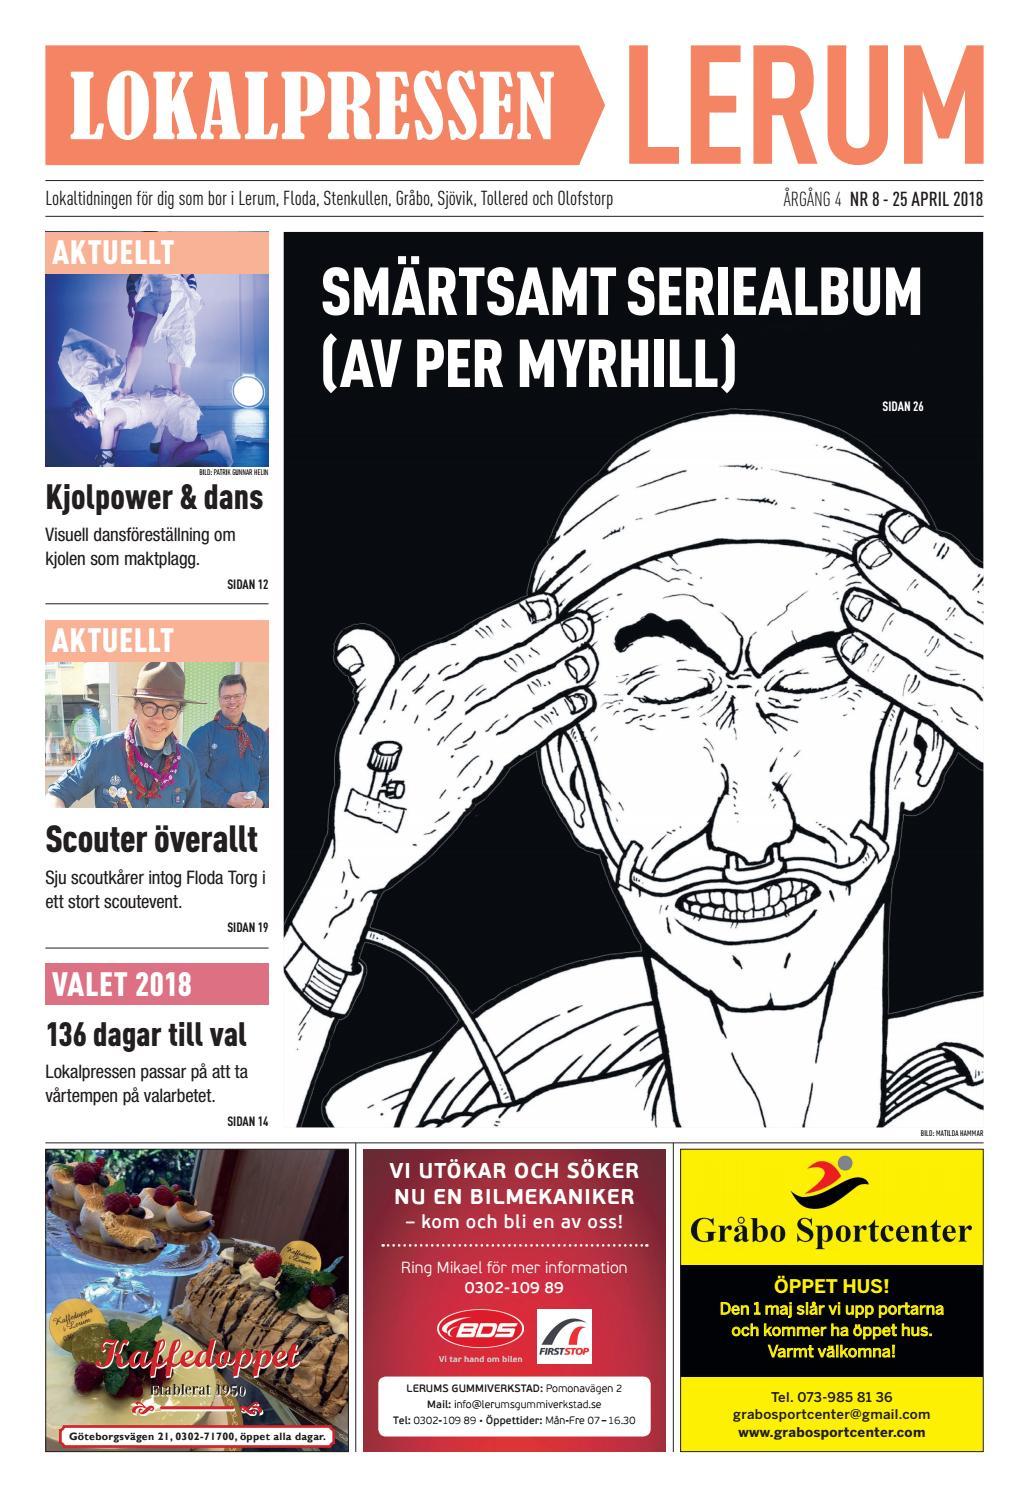 Mats Larsson, Sltthultsvgen 78D, Stenkullen | patient-survey.net